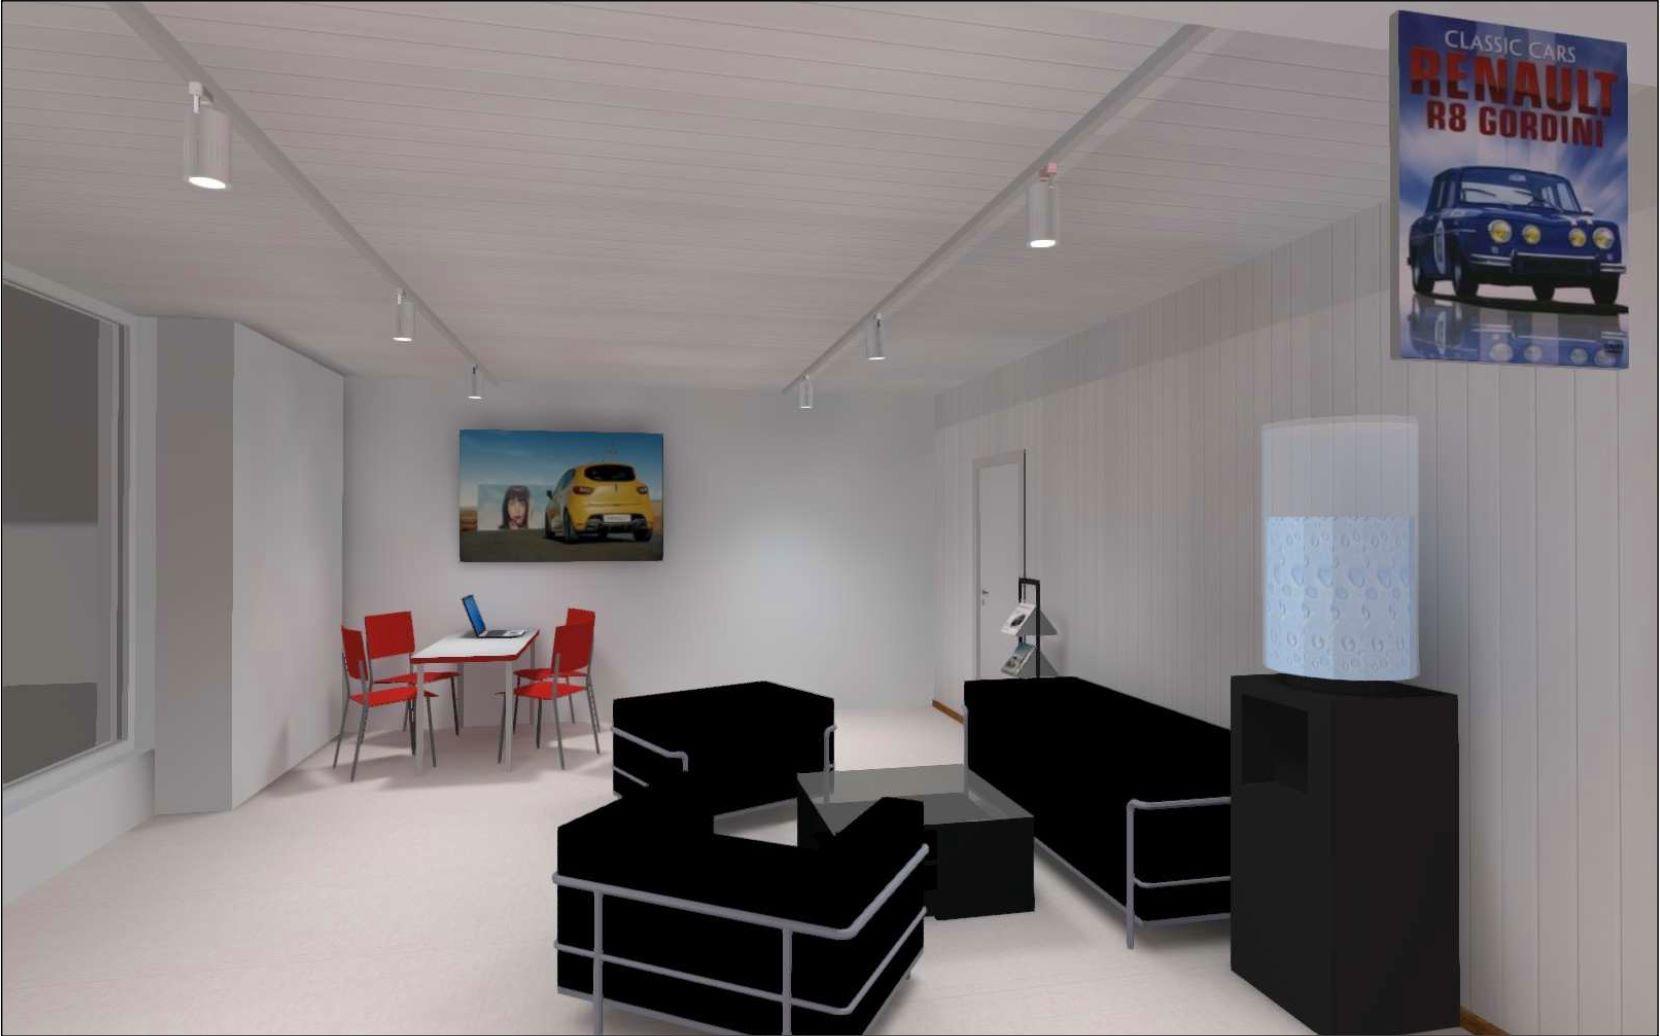 Etude d'éclairage show-room Renaud